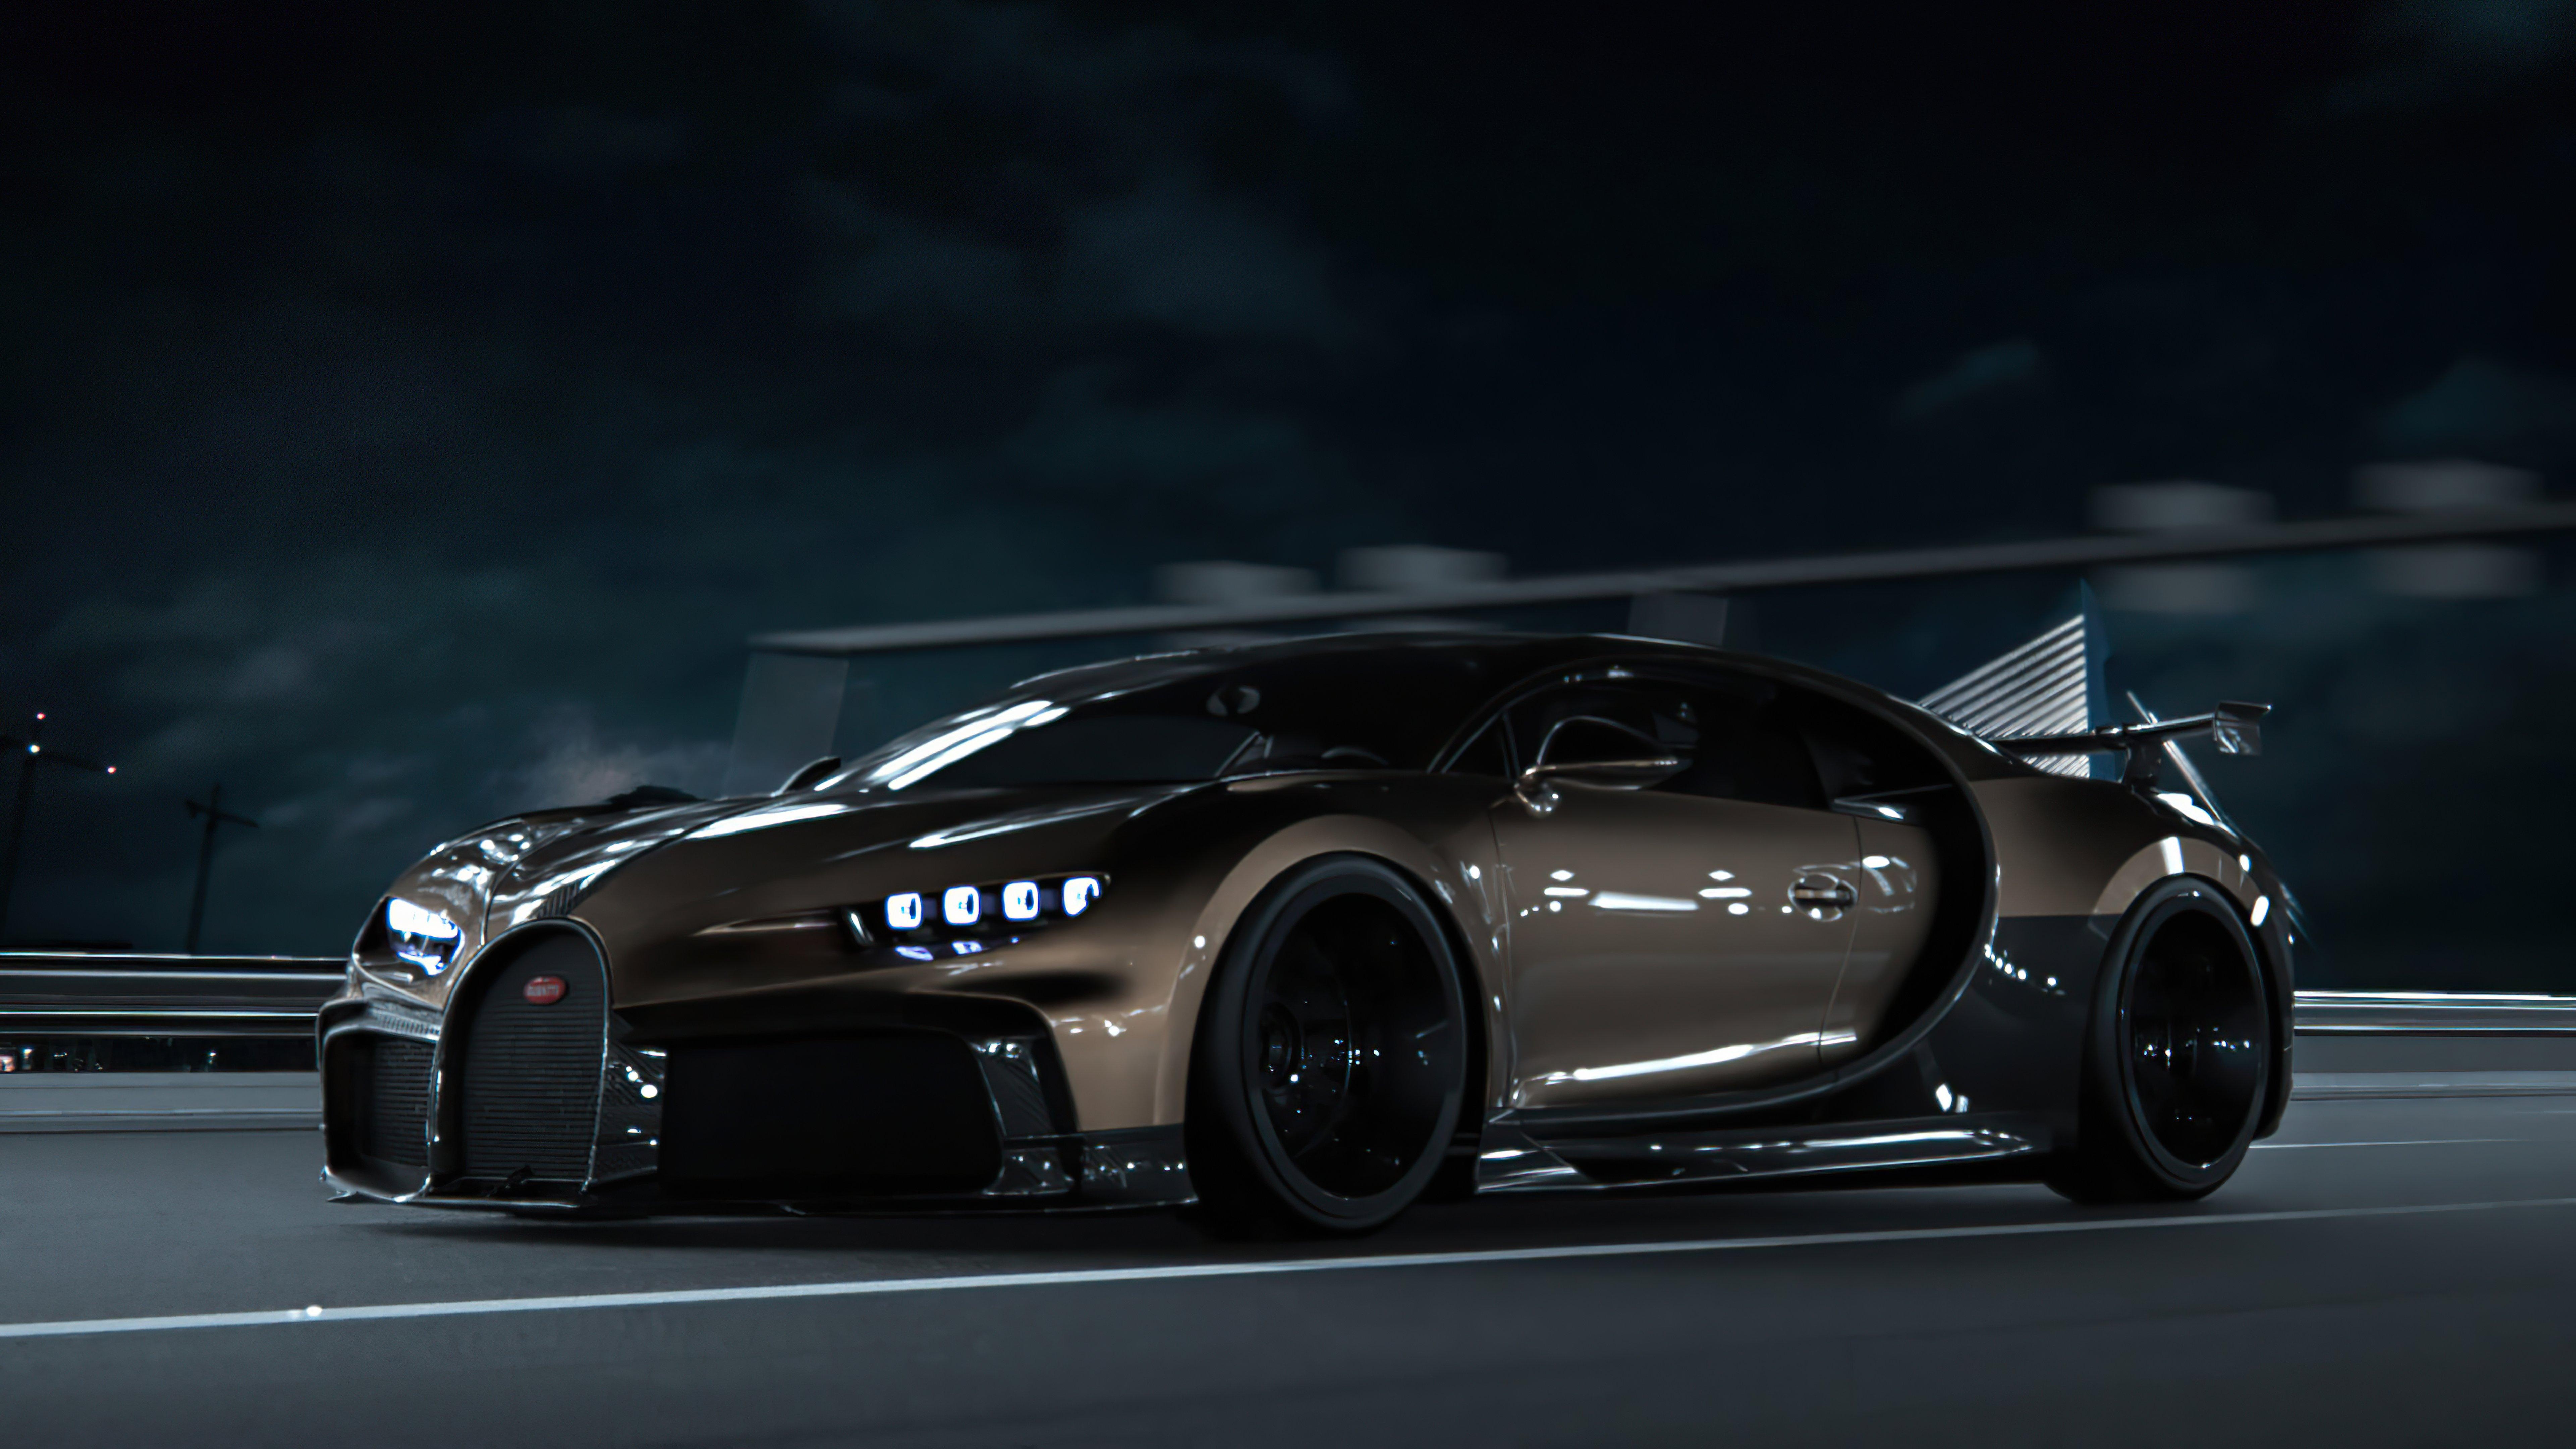 Fondos de pantalla Bugatti Chiron CGI